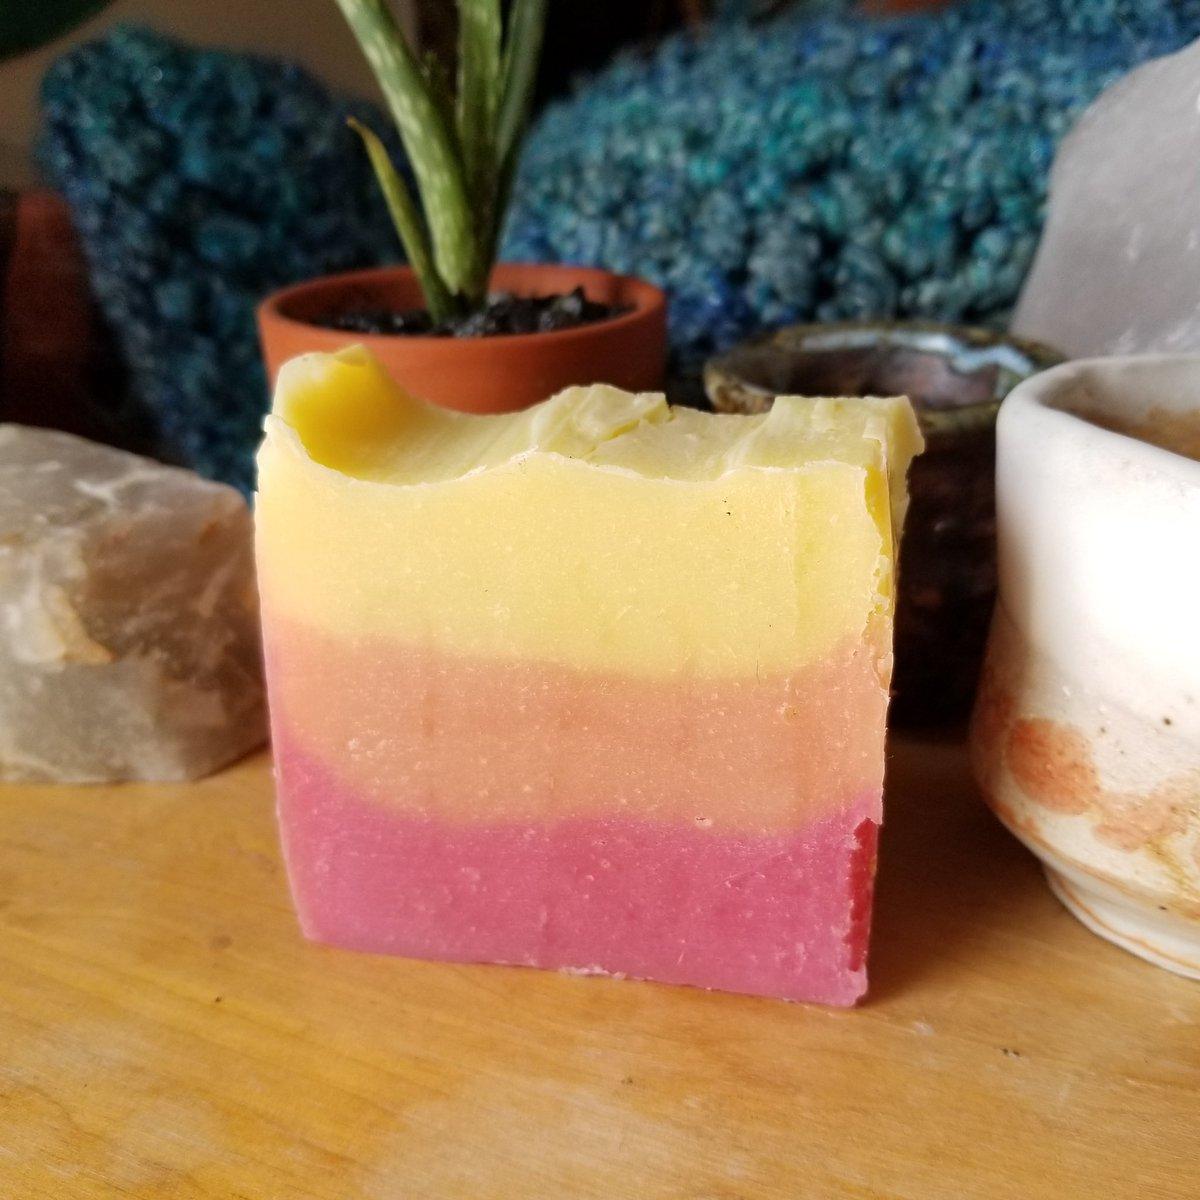 Phoenix Luxury Soap #luxury #handmade #soappic.twitter.com/Pcpr2mSFgE